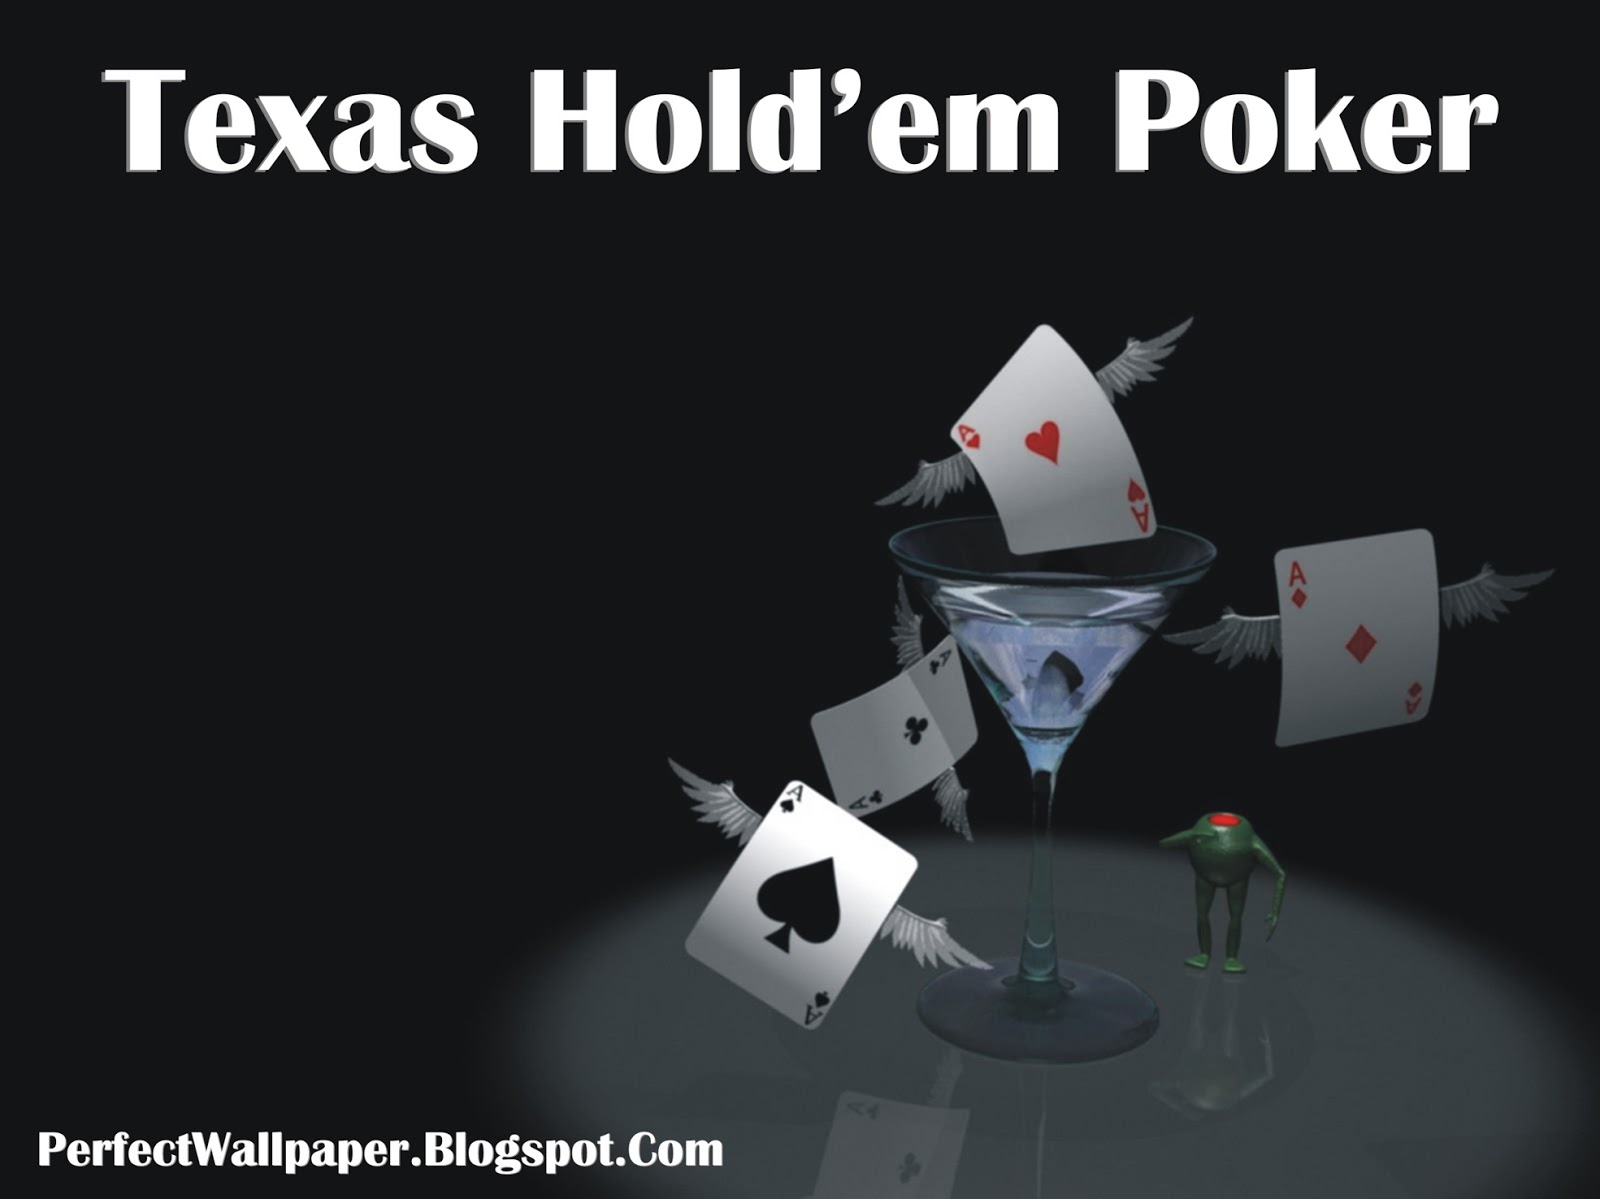 texas hold em poker pictures texas hold em poker images texas hold em ...